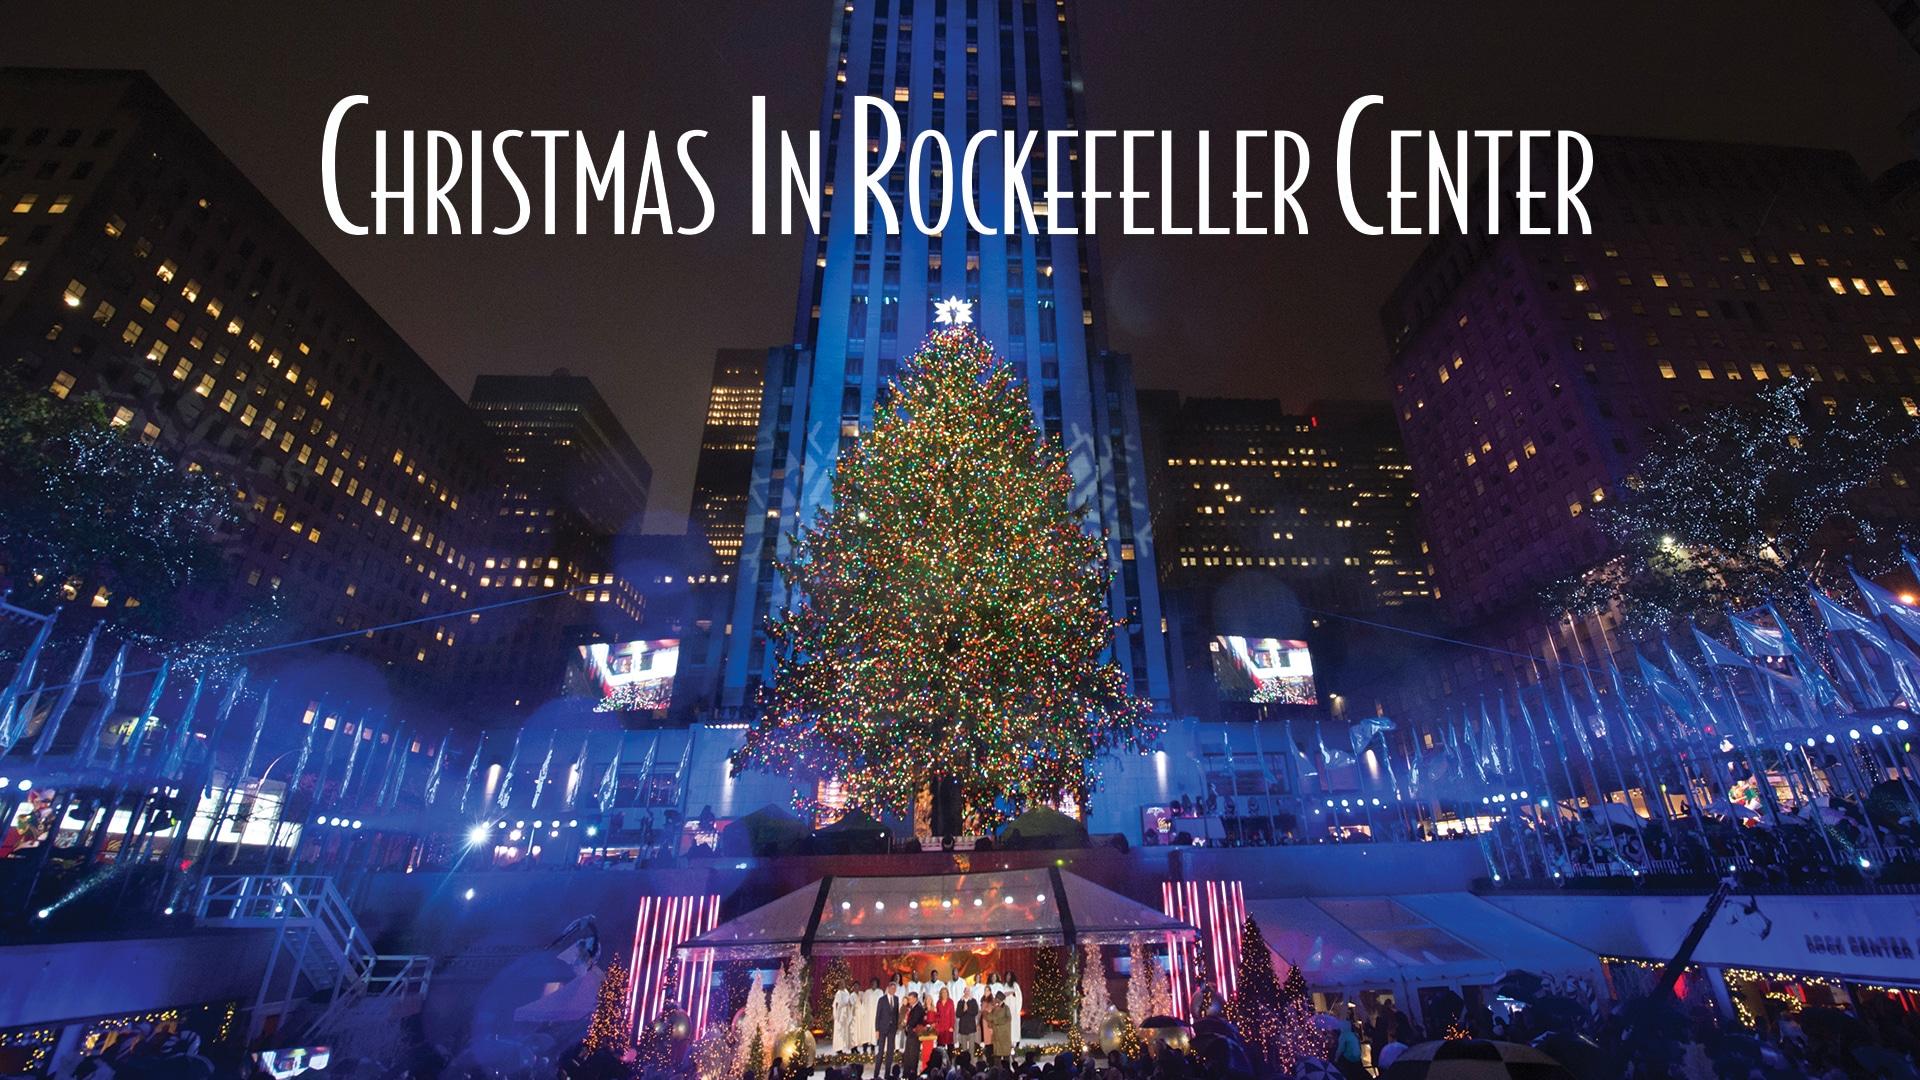 Christmas in rockefeller center for Craft fair nyc 2017